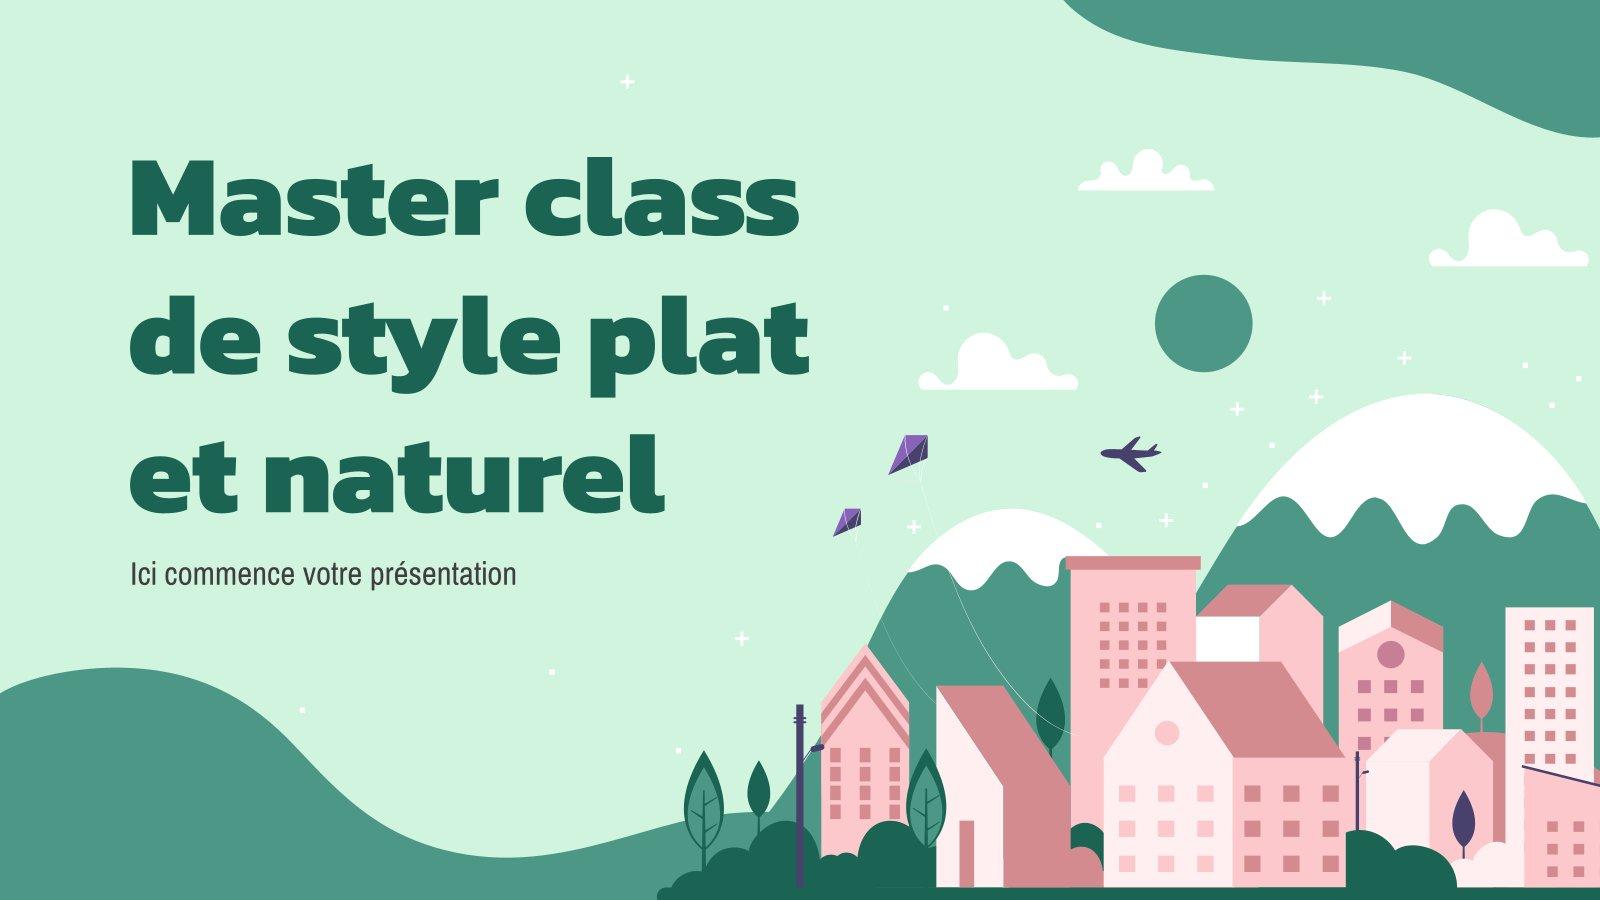 Master class de style plat et naturel presentation template